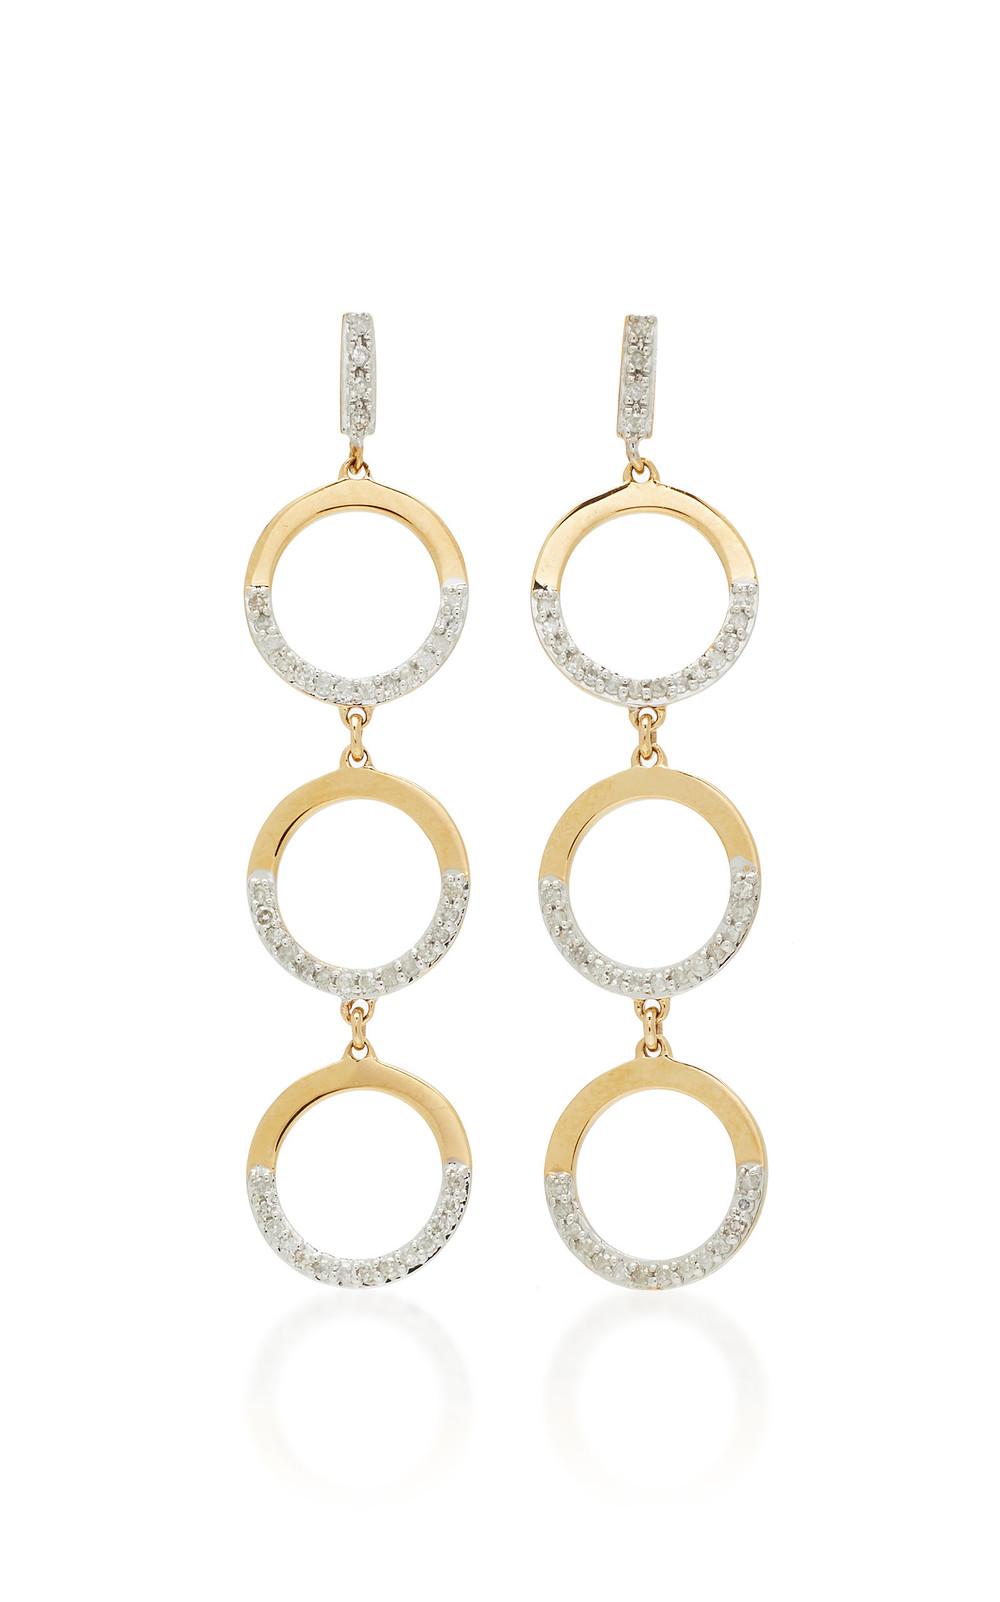 Mateo 14K Gold Tiered Hoop Drop Earrings in white